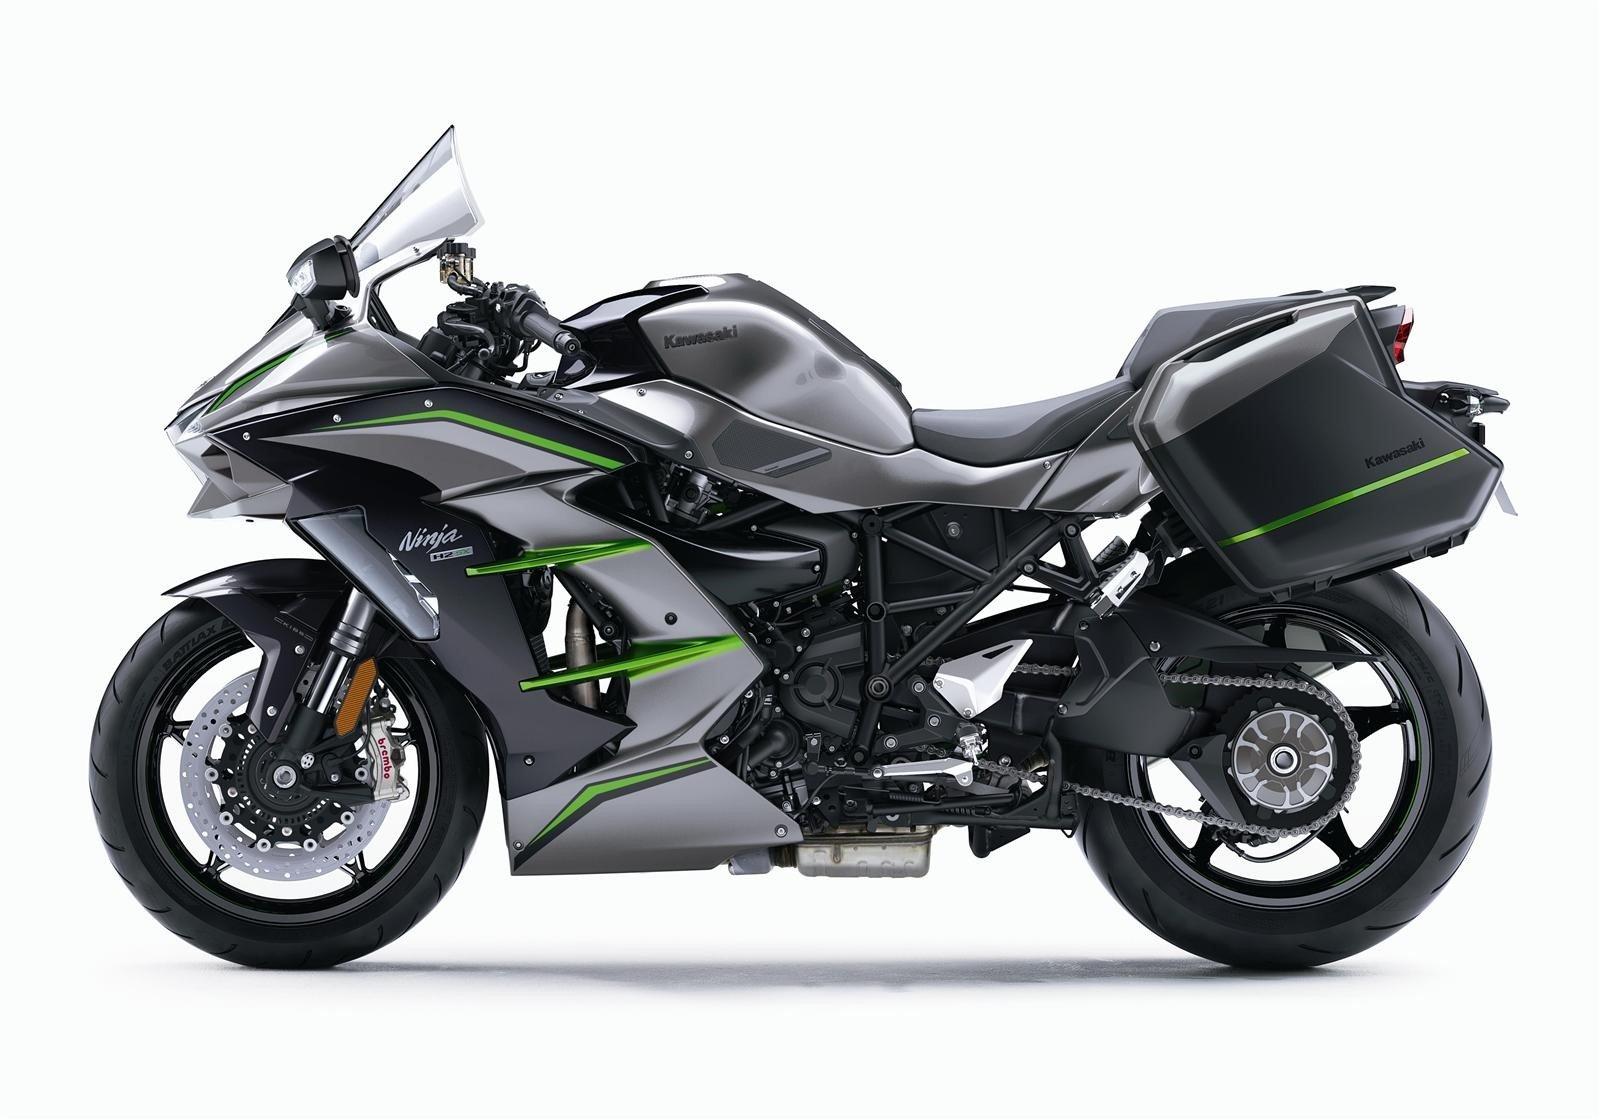 New 2019 Kawasaki Ninja H2 SX SE+ Tourer*£1000 Deposit PAID* For Sale (picture 2 of 6)